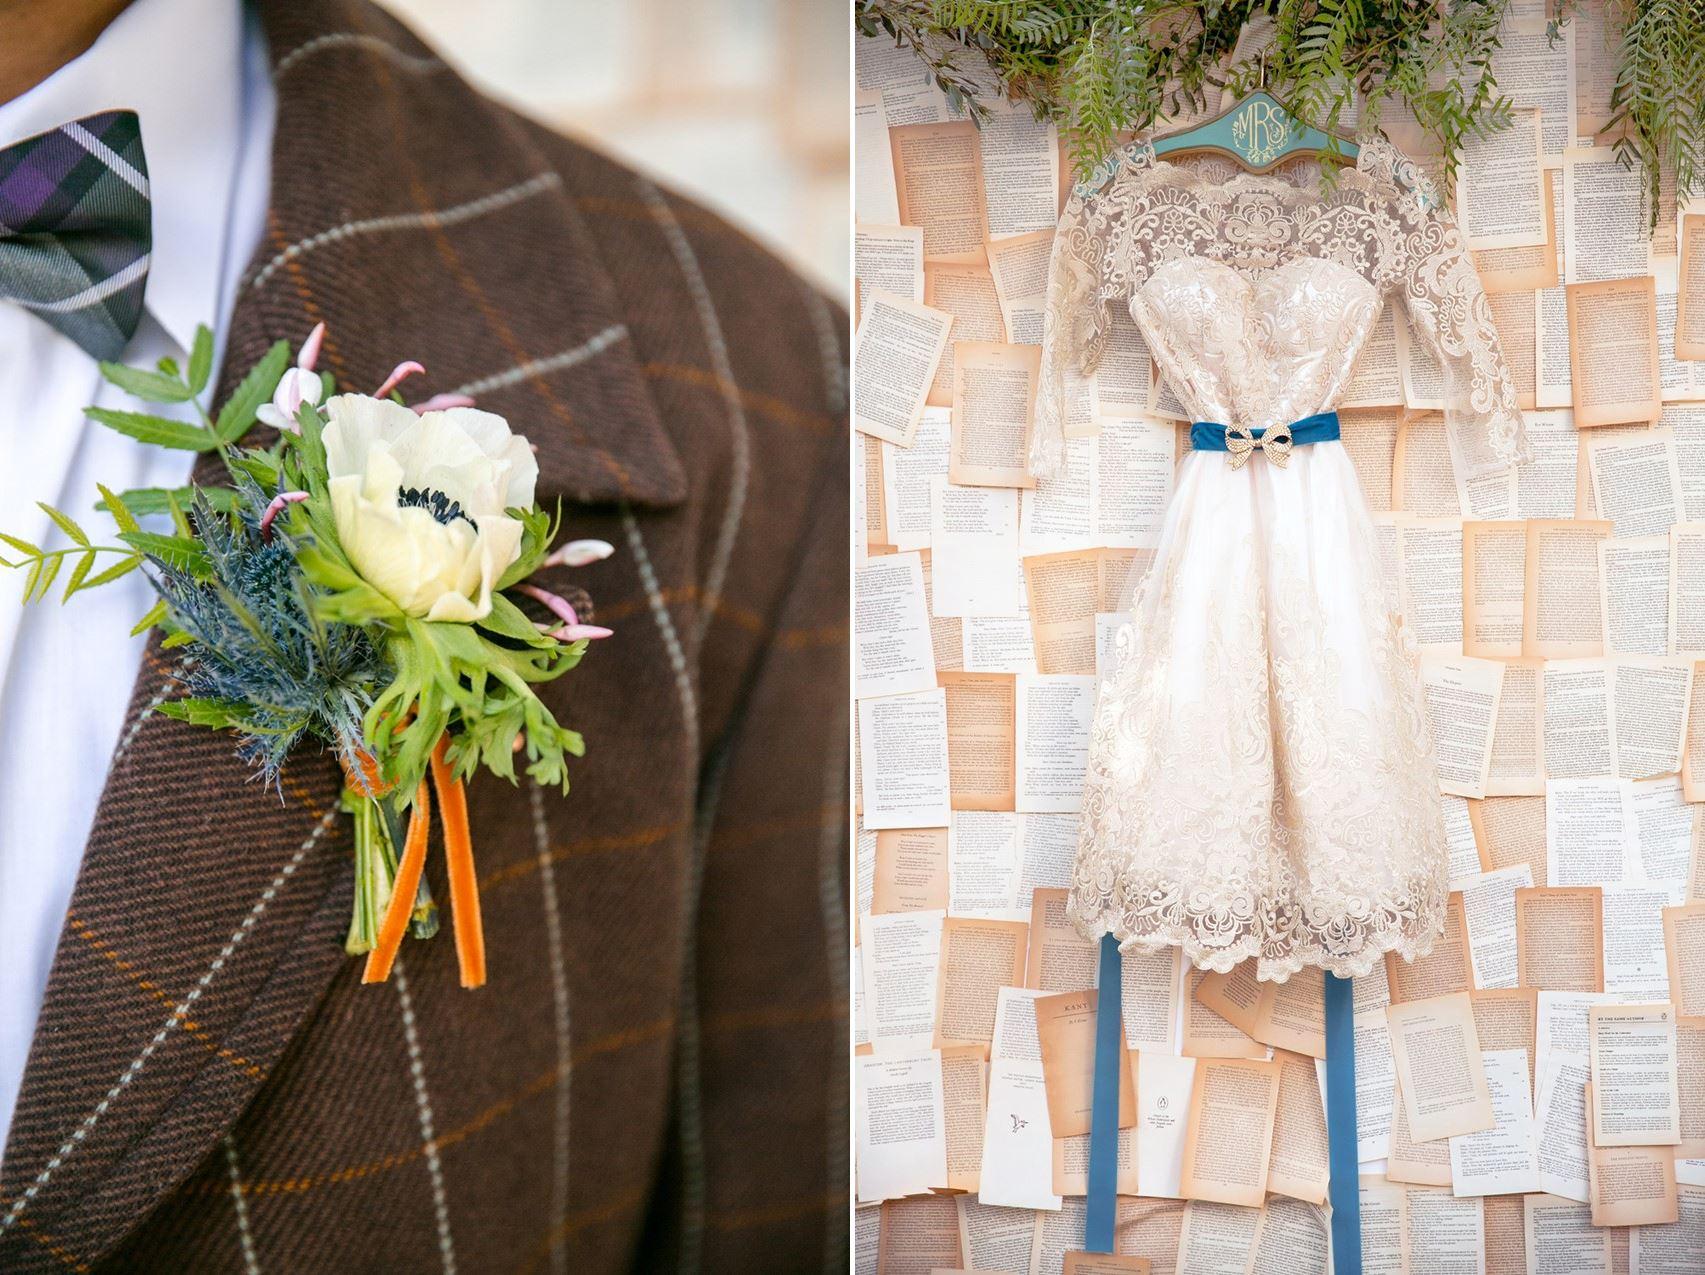 Vintage Wedding Dress - Mid-Century Vintage Wedding Shoot Inspired by Penguin Books